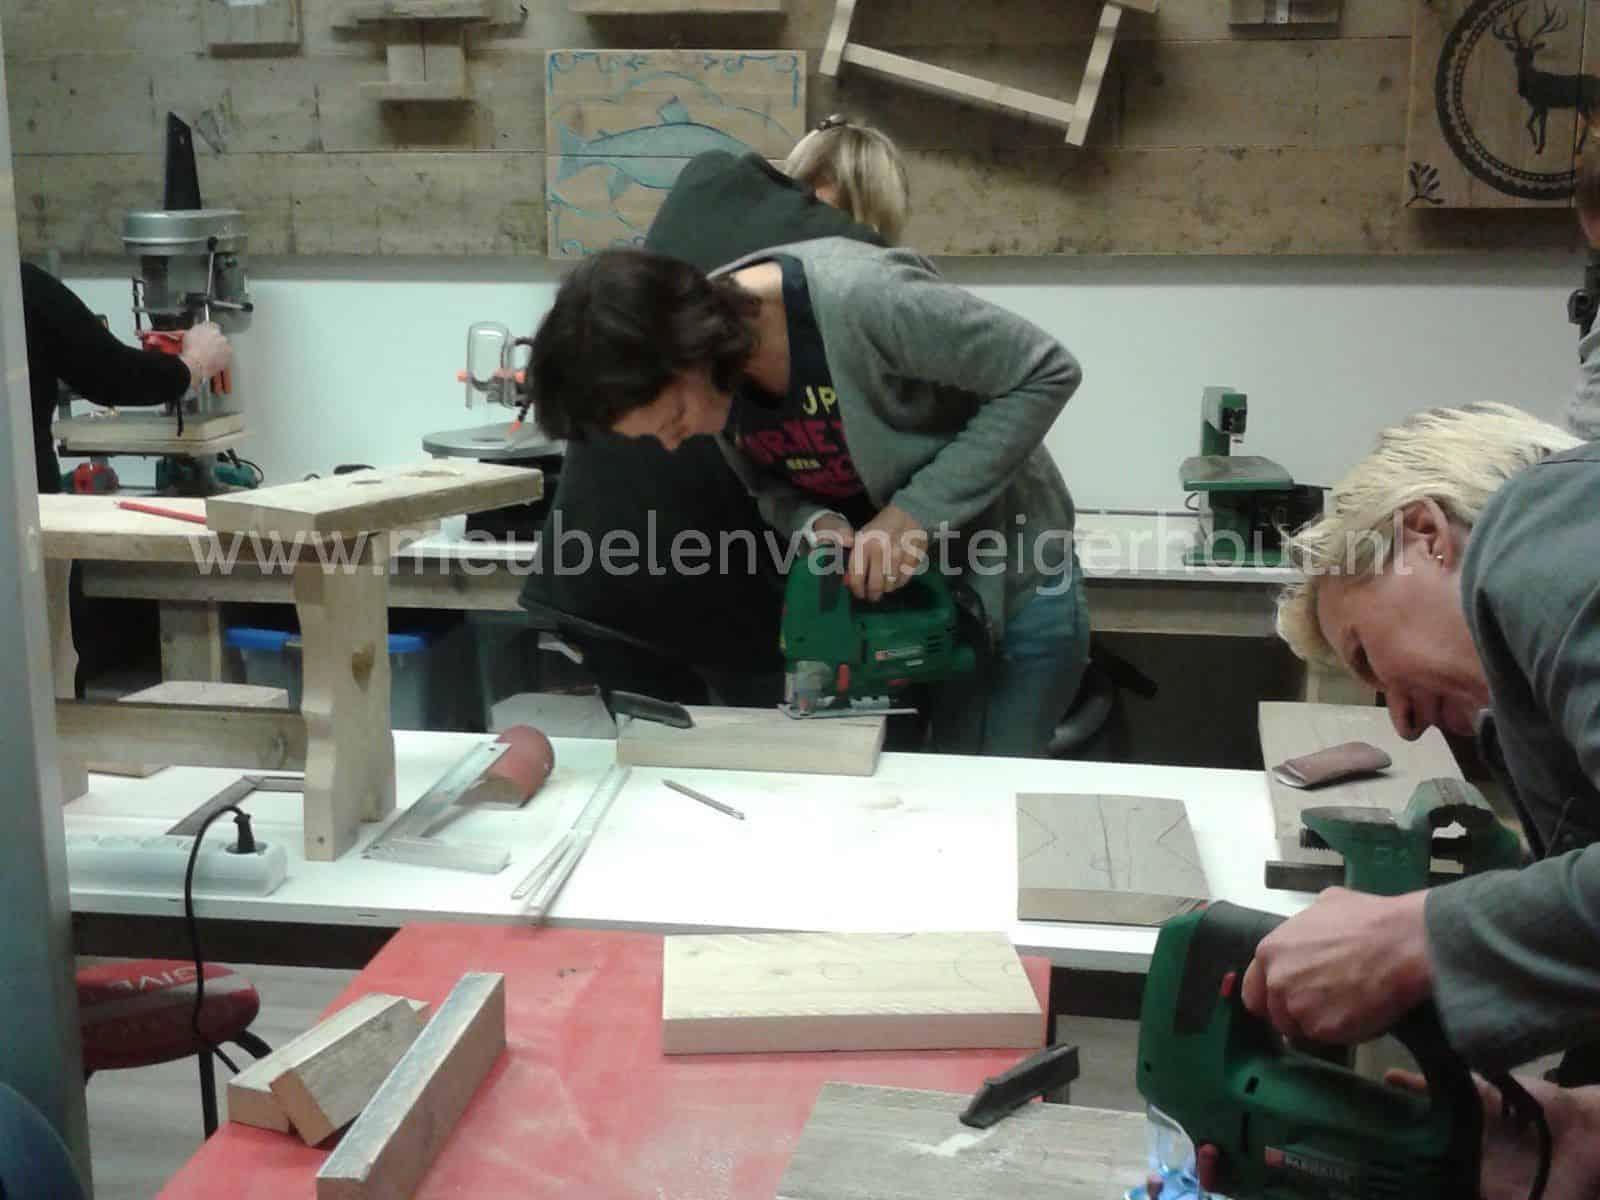 Alle workshops met steigerhout op een rij